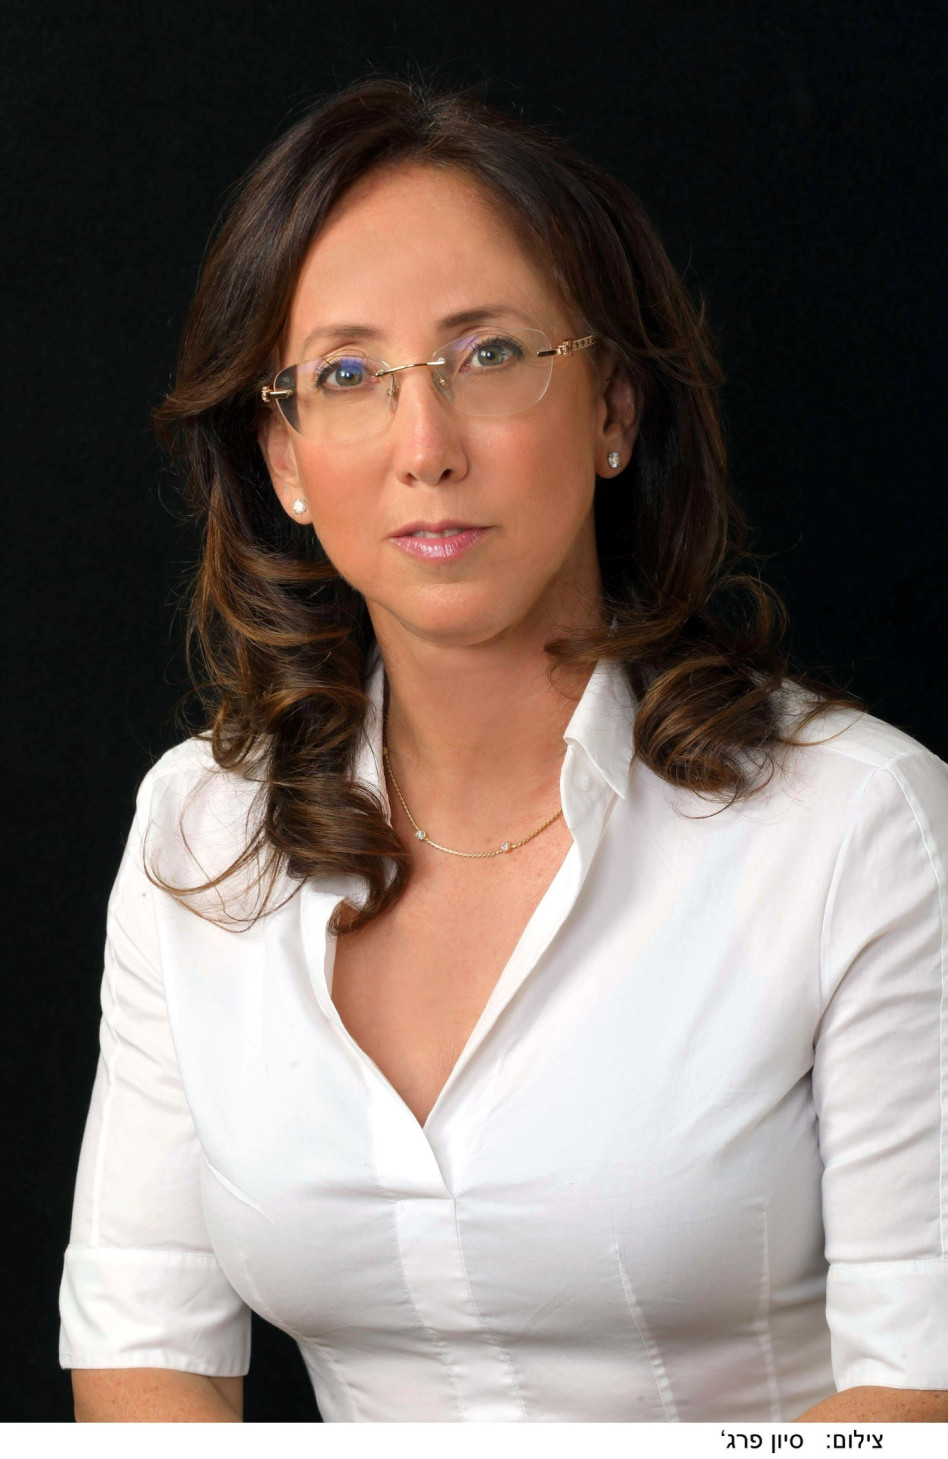 קרין מאיר רובינשטיין (צילום: סיון פרג')